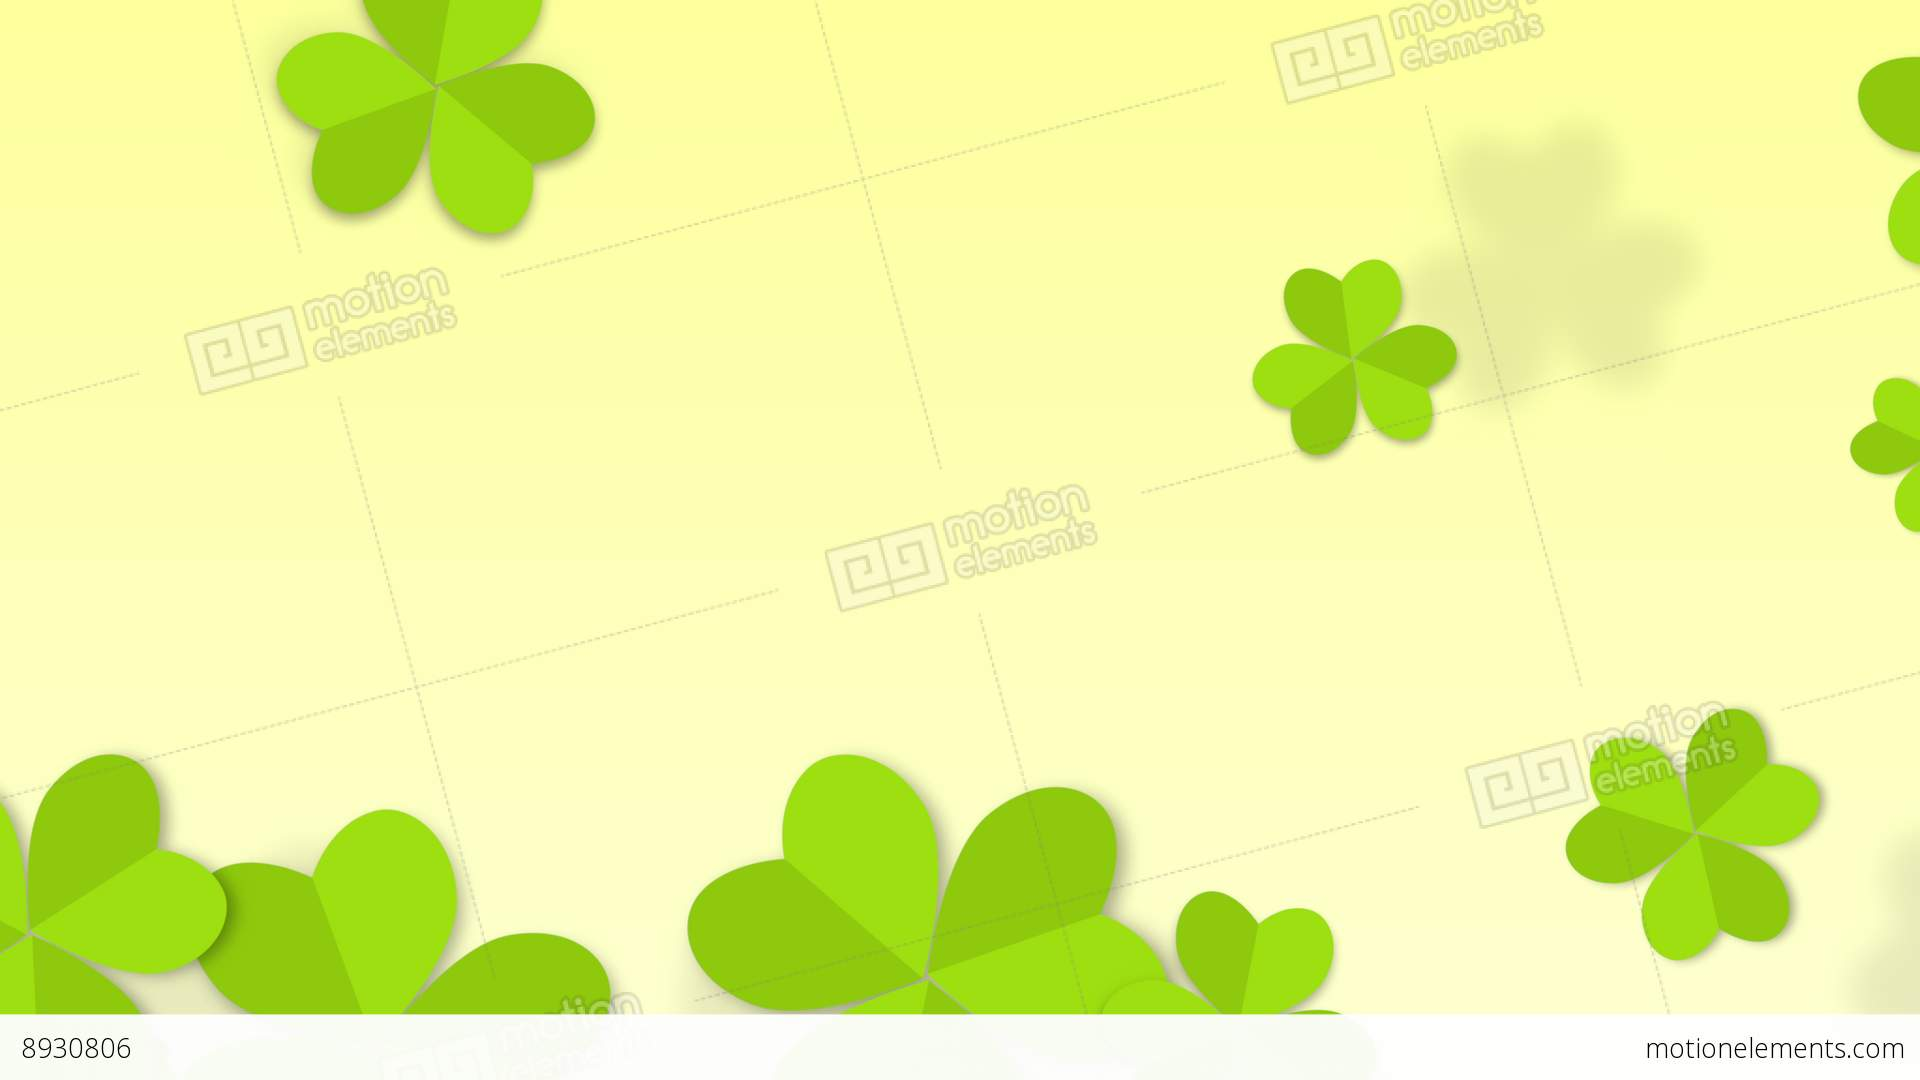 St patricks clover animated background stock animation 8930806 st patricks clover animated background stock video footage biocorpaavc